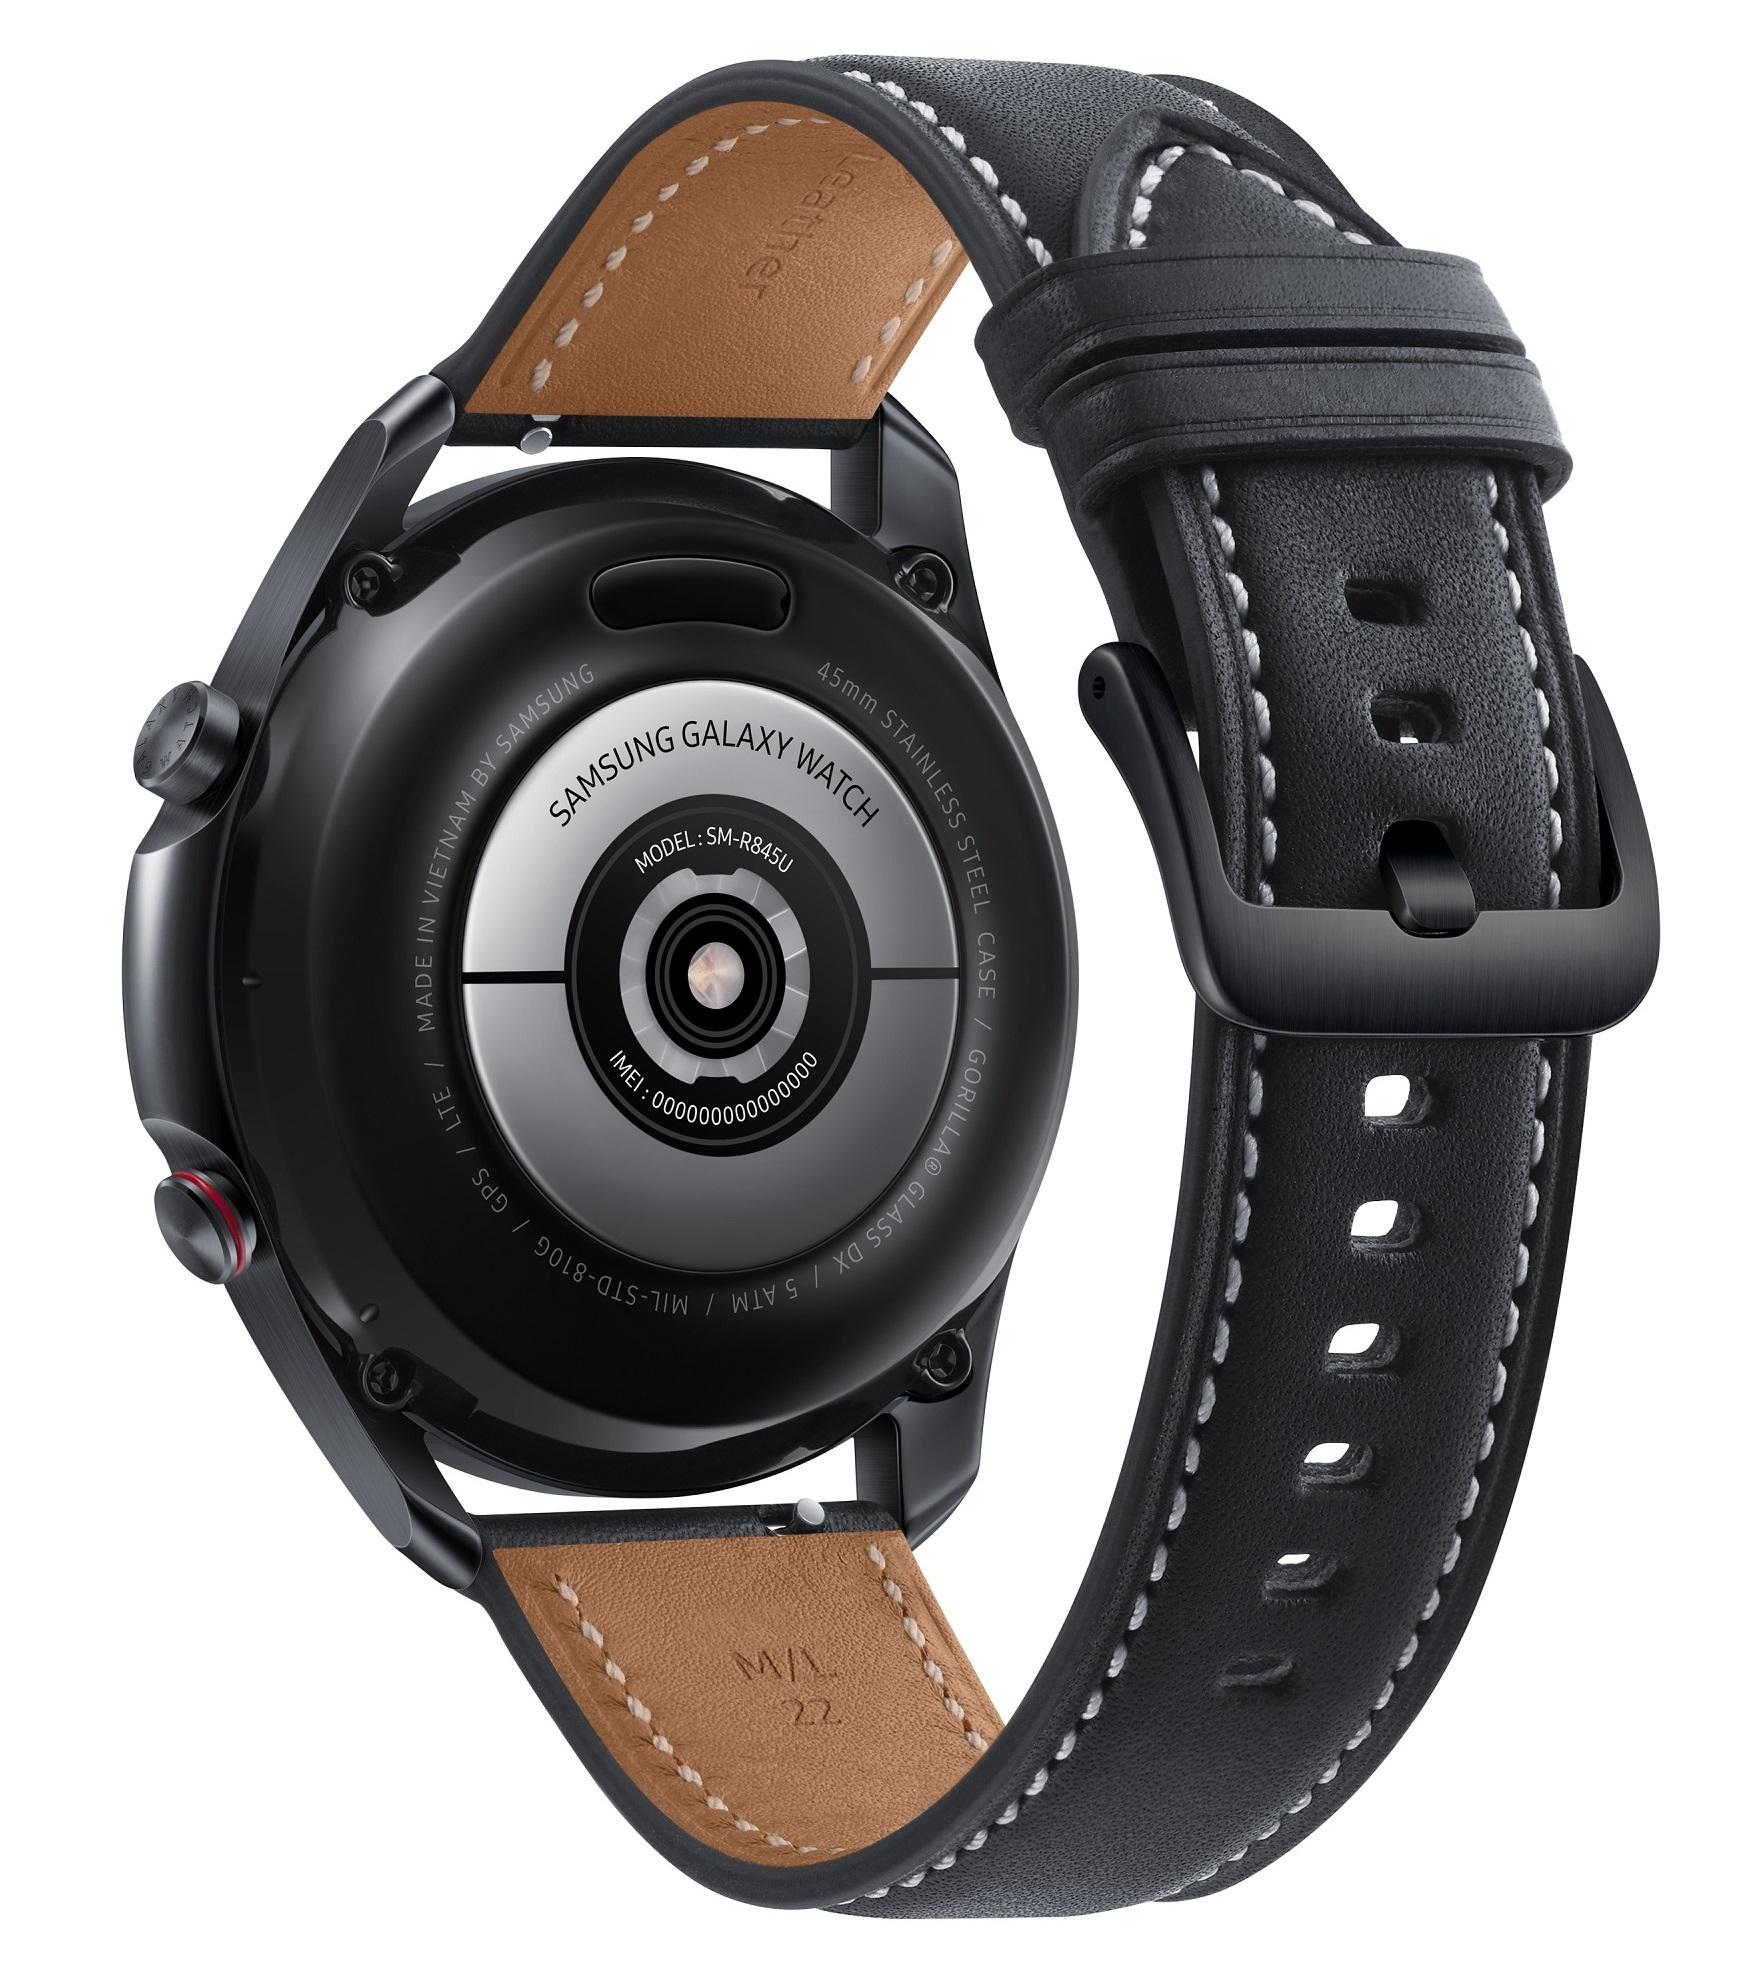 Montre connectée Galaxy Watch 3 SM-R840 4G 45 mm Samsung Noir